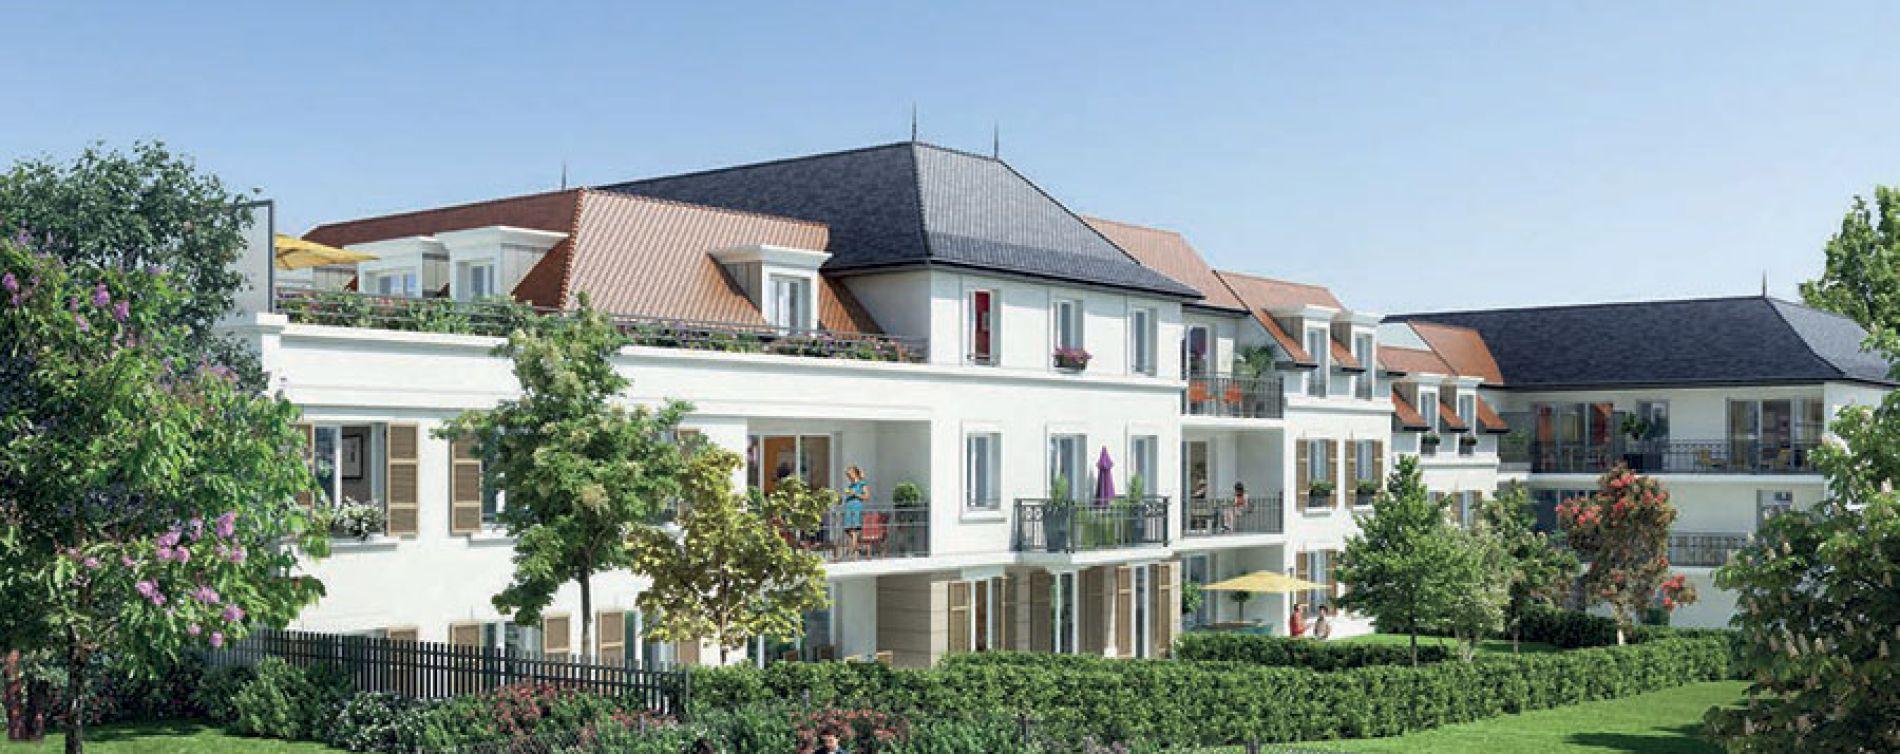 Domont : programme immobilier neuve « Programme immobilier n°212738 » (2)